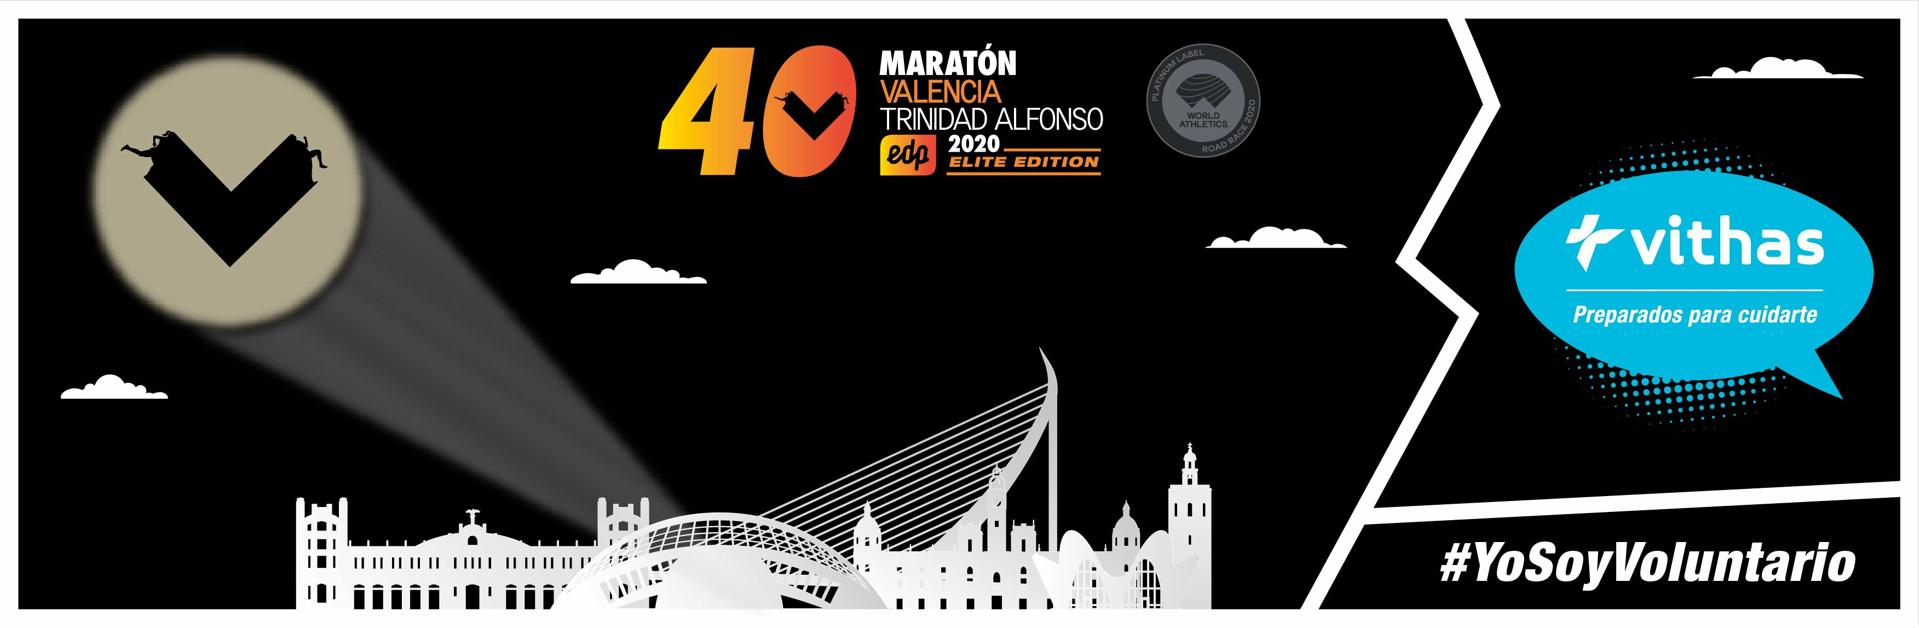 Maratón Elite Edition